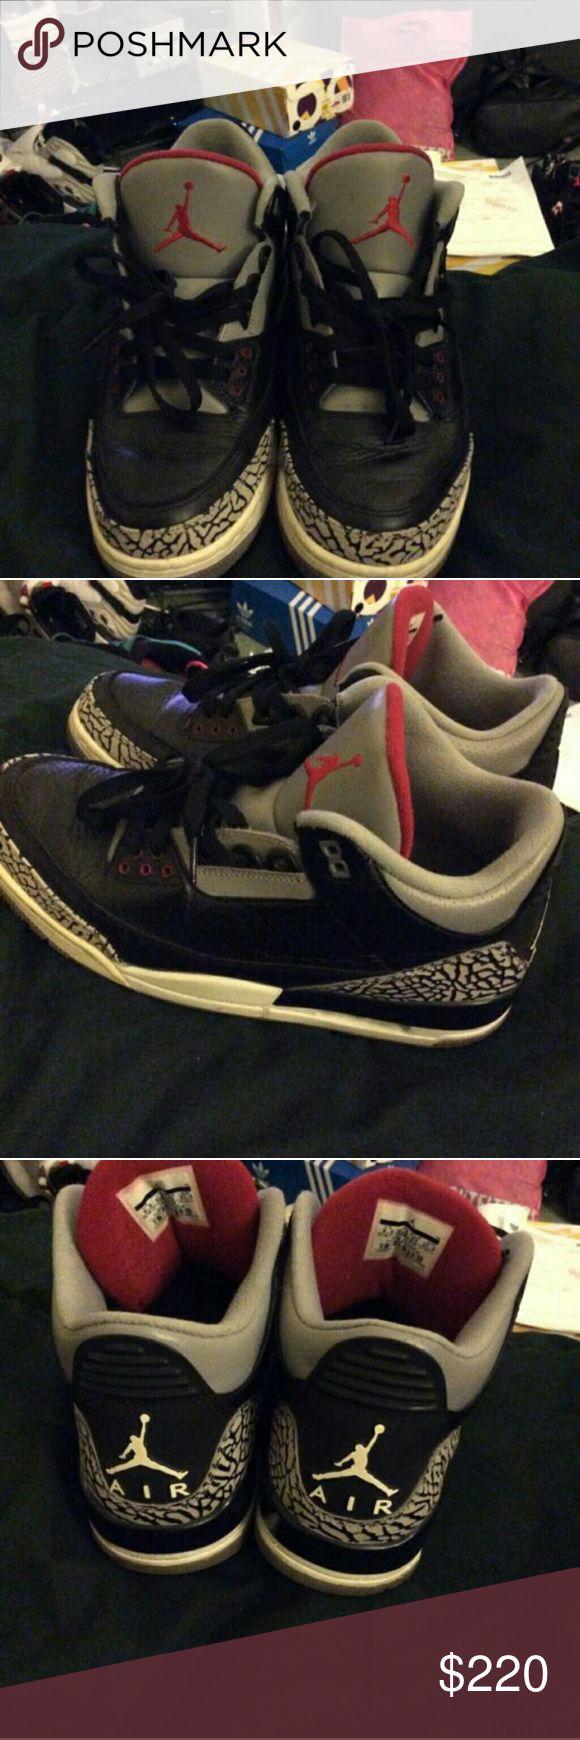 Jordan black cement 3 Jordan black cement 3 size 9.5 work handful of time slight cracking 100 percent authentic missing box , NO TRADES . Jordan Shoes Sneakers